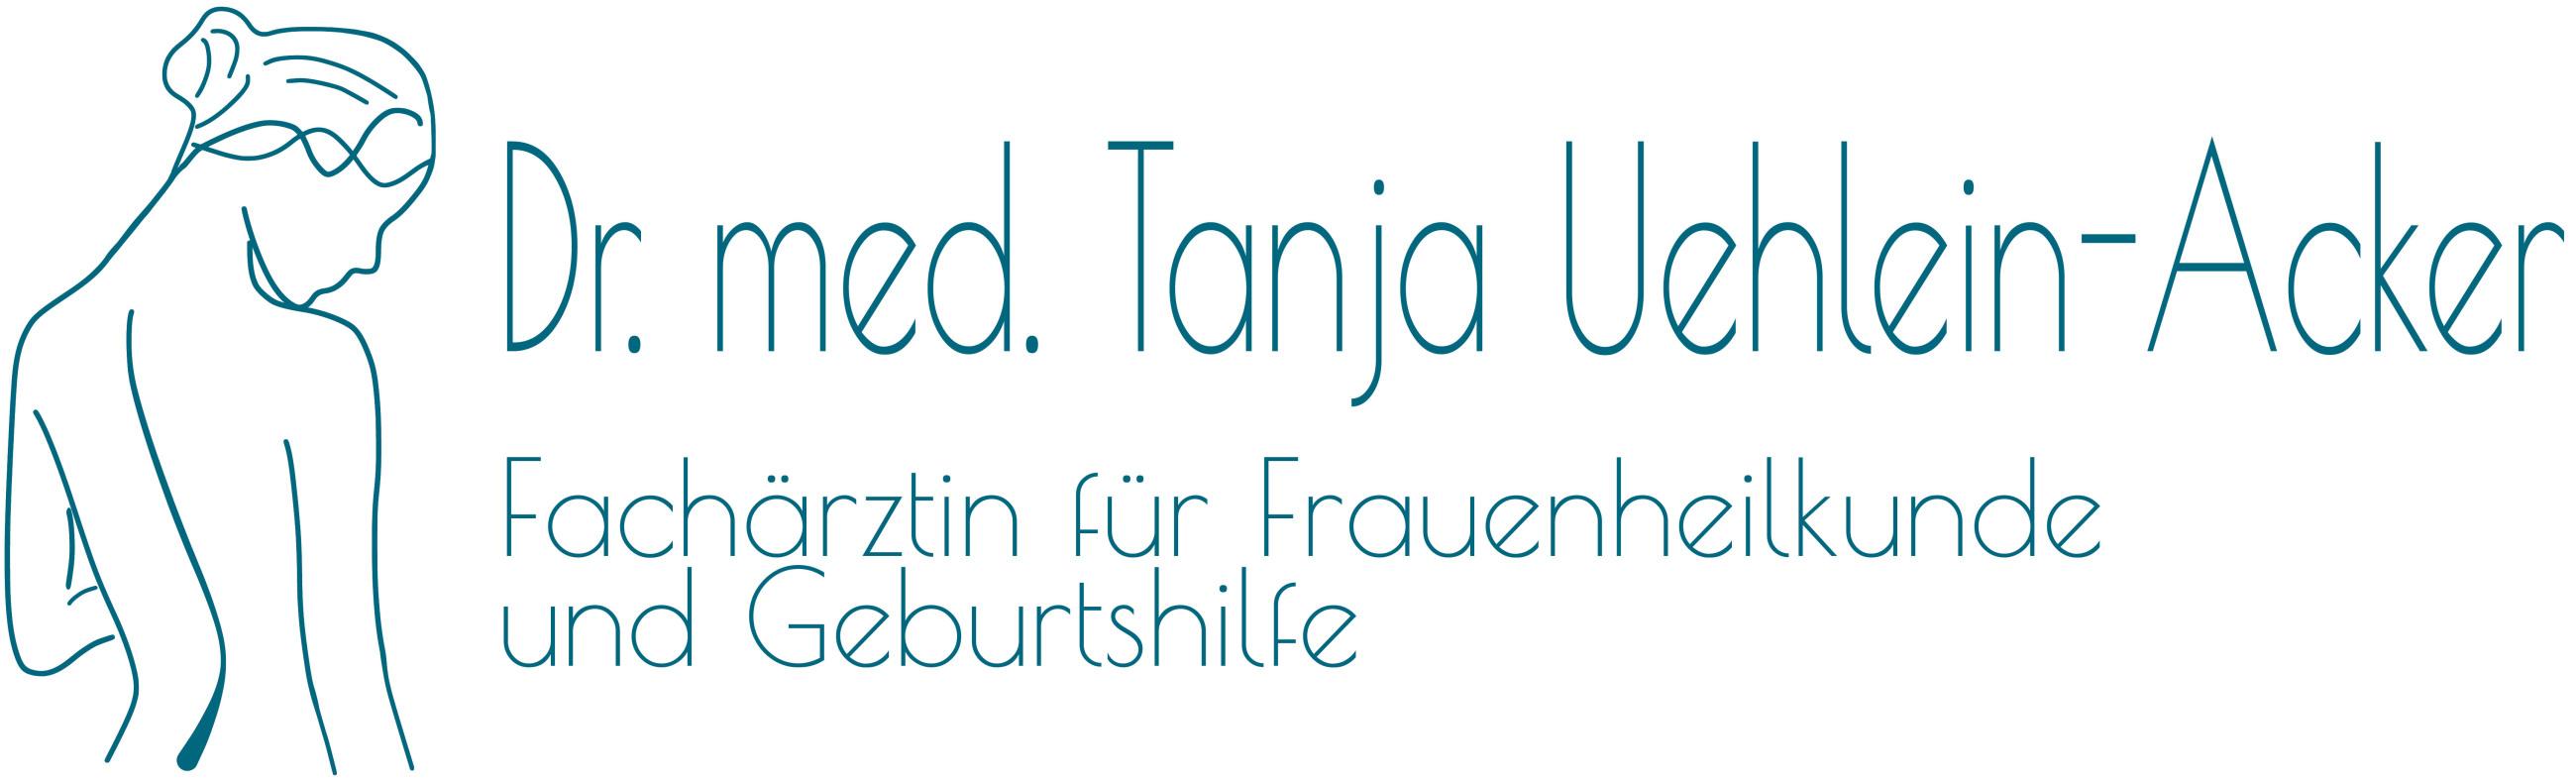 frauenarzt-praxis-uehlein-acker-heidelberg-logo